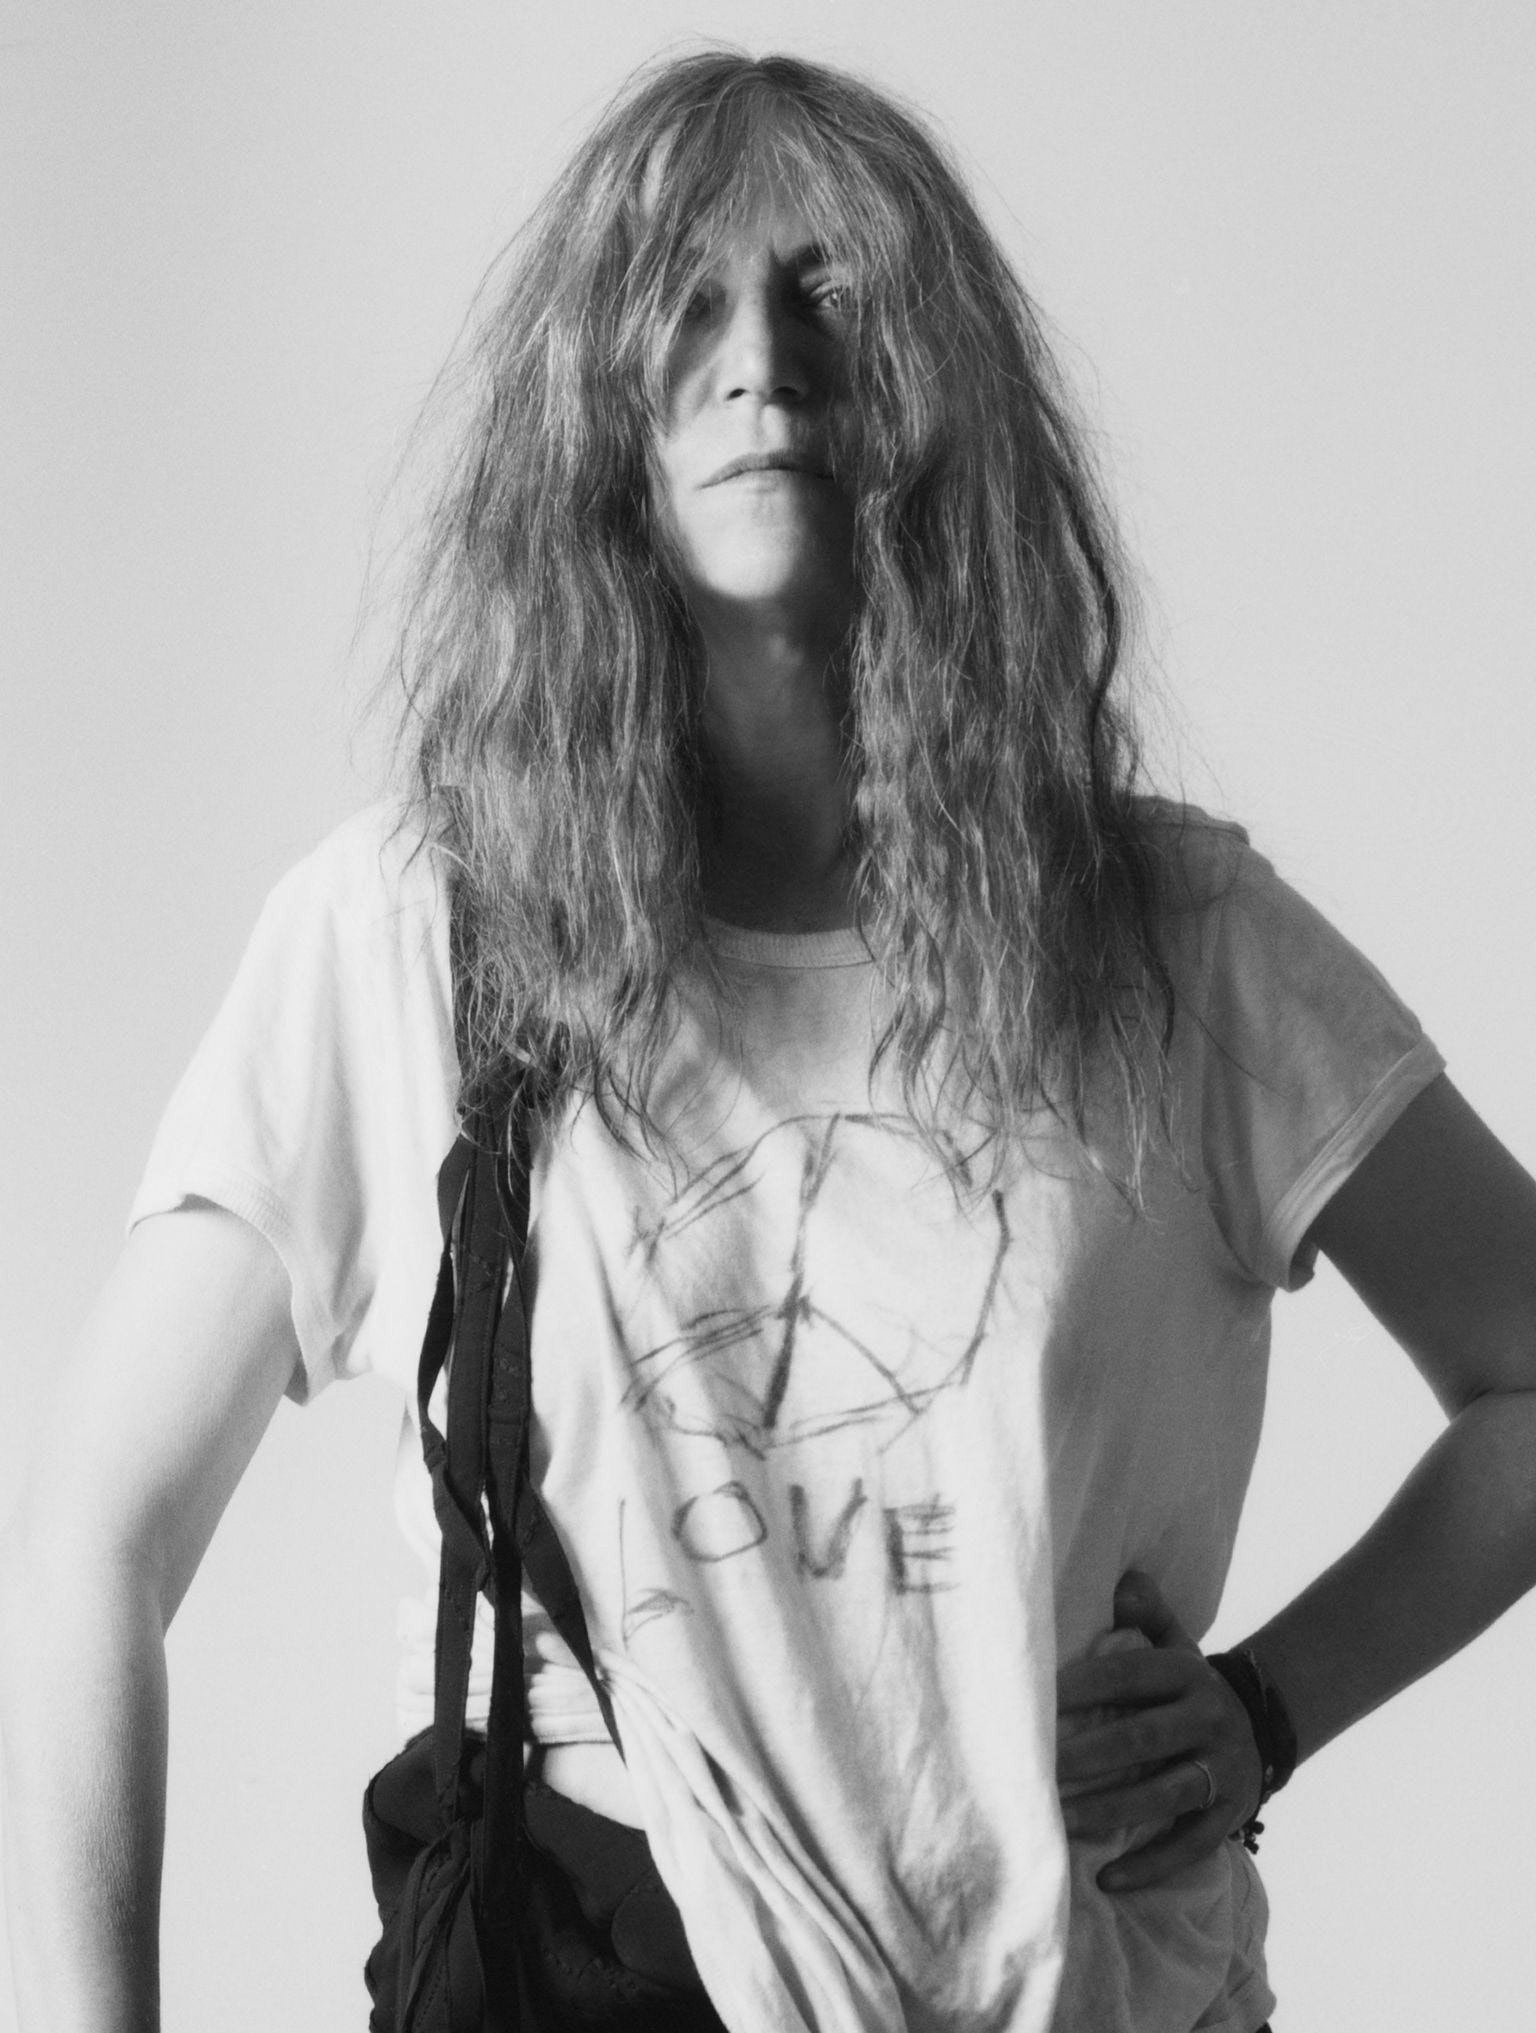 Punk icon Patti Smith headlining the Ryman Auditorium this fall